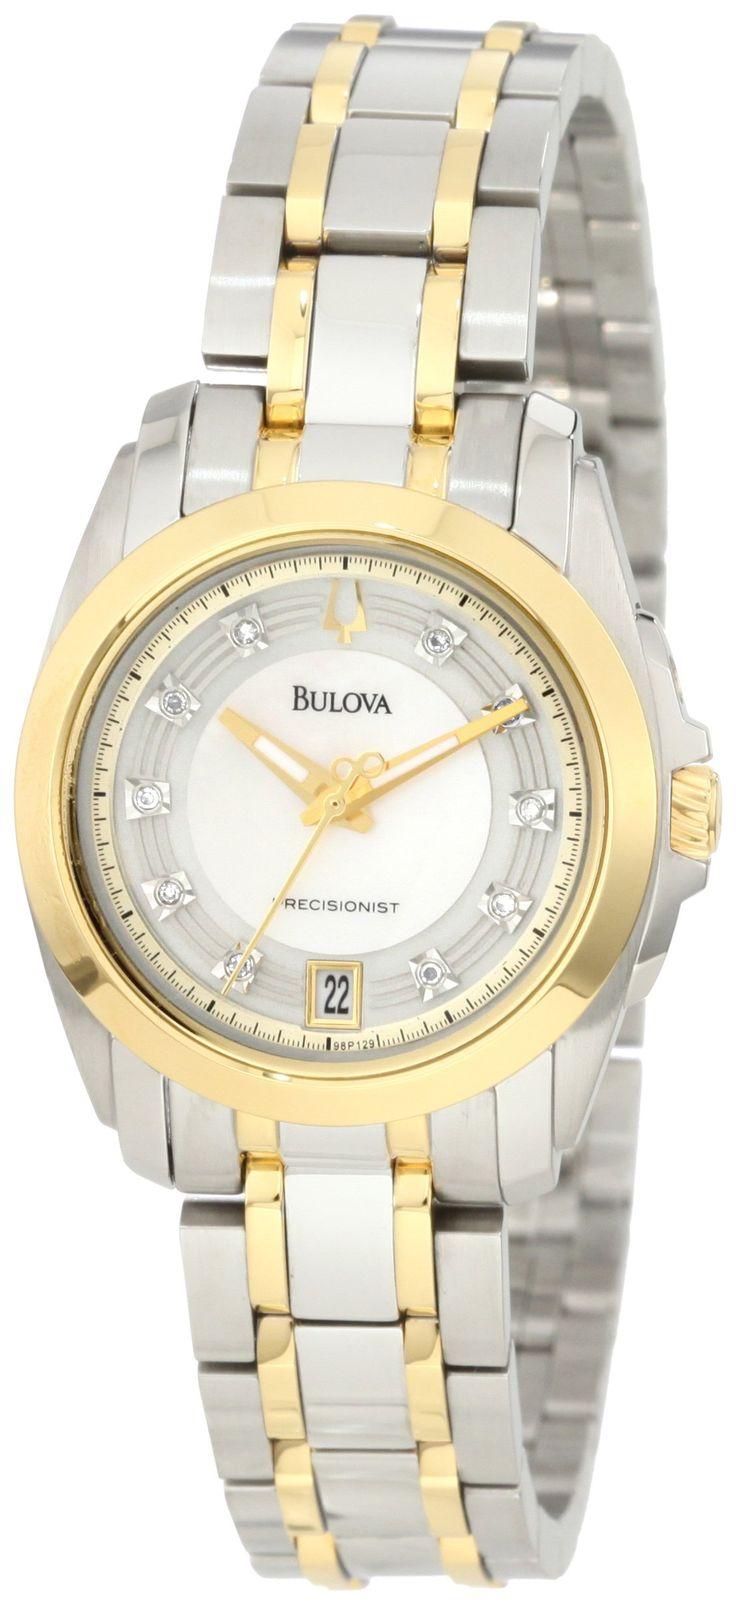 Bulova Women's 98P129 Precisionist Longwood Ion plated Watch